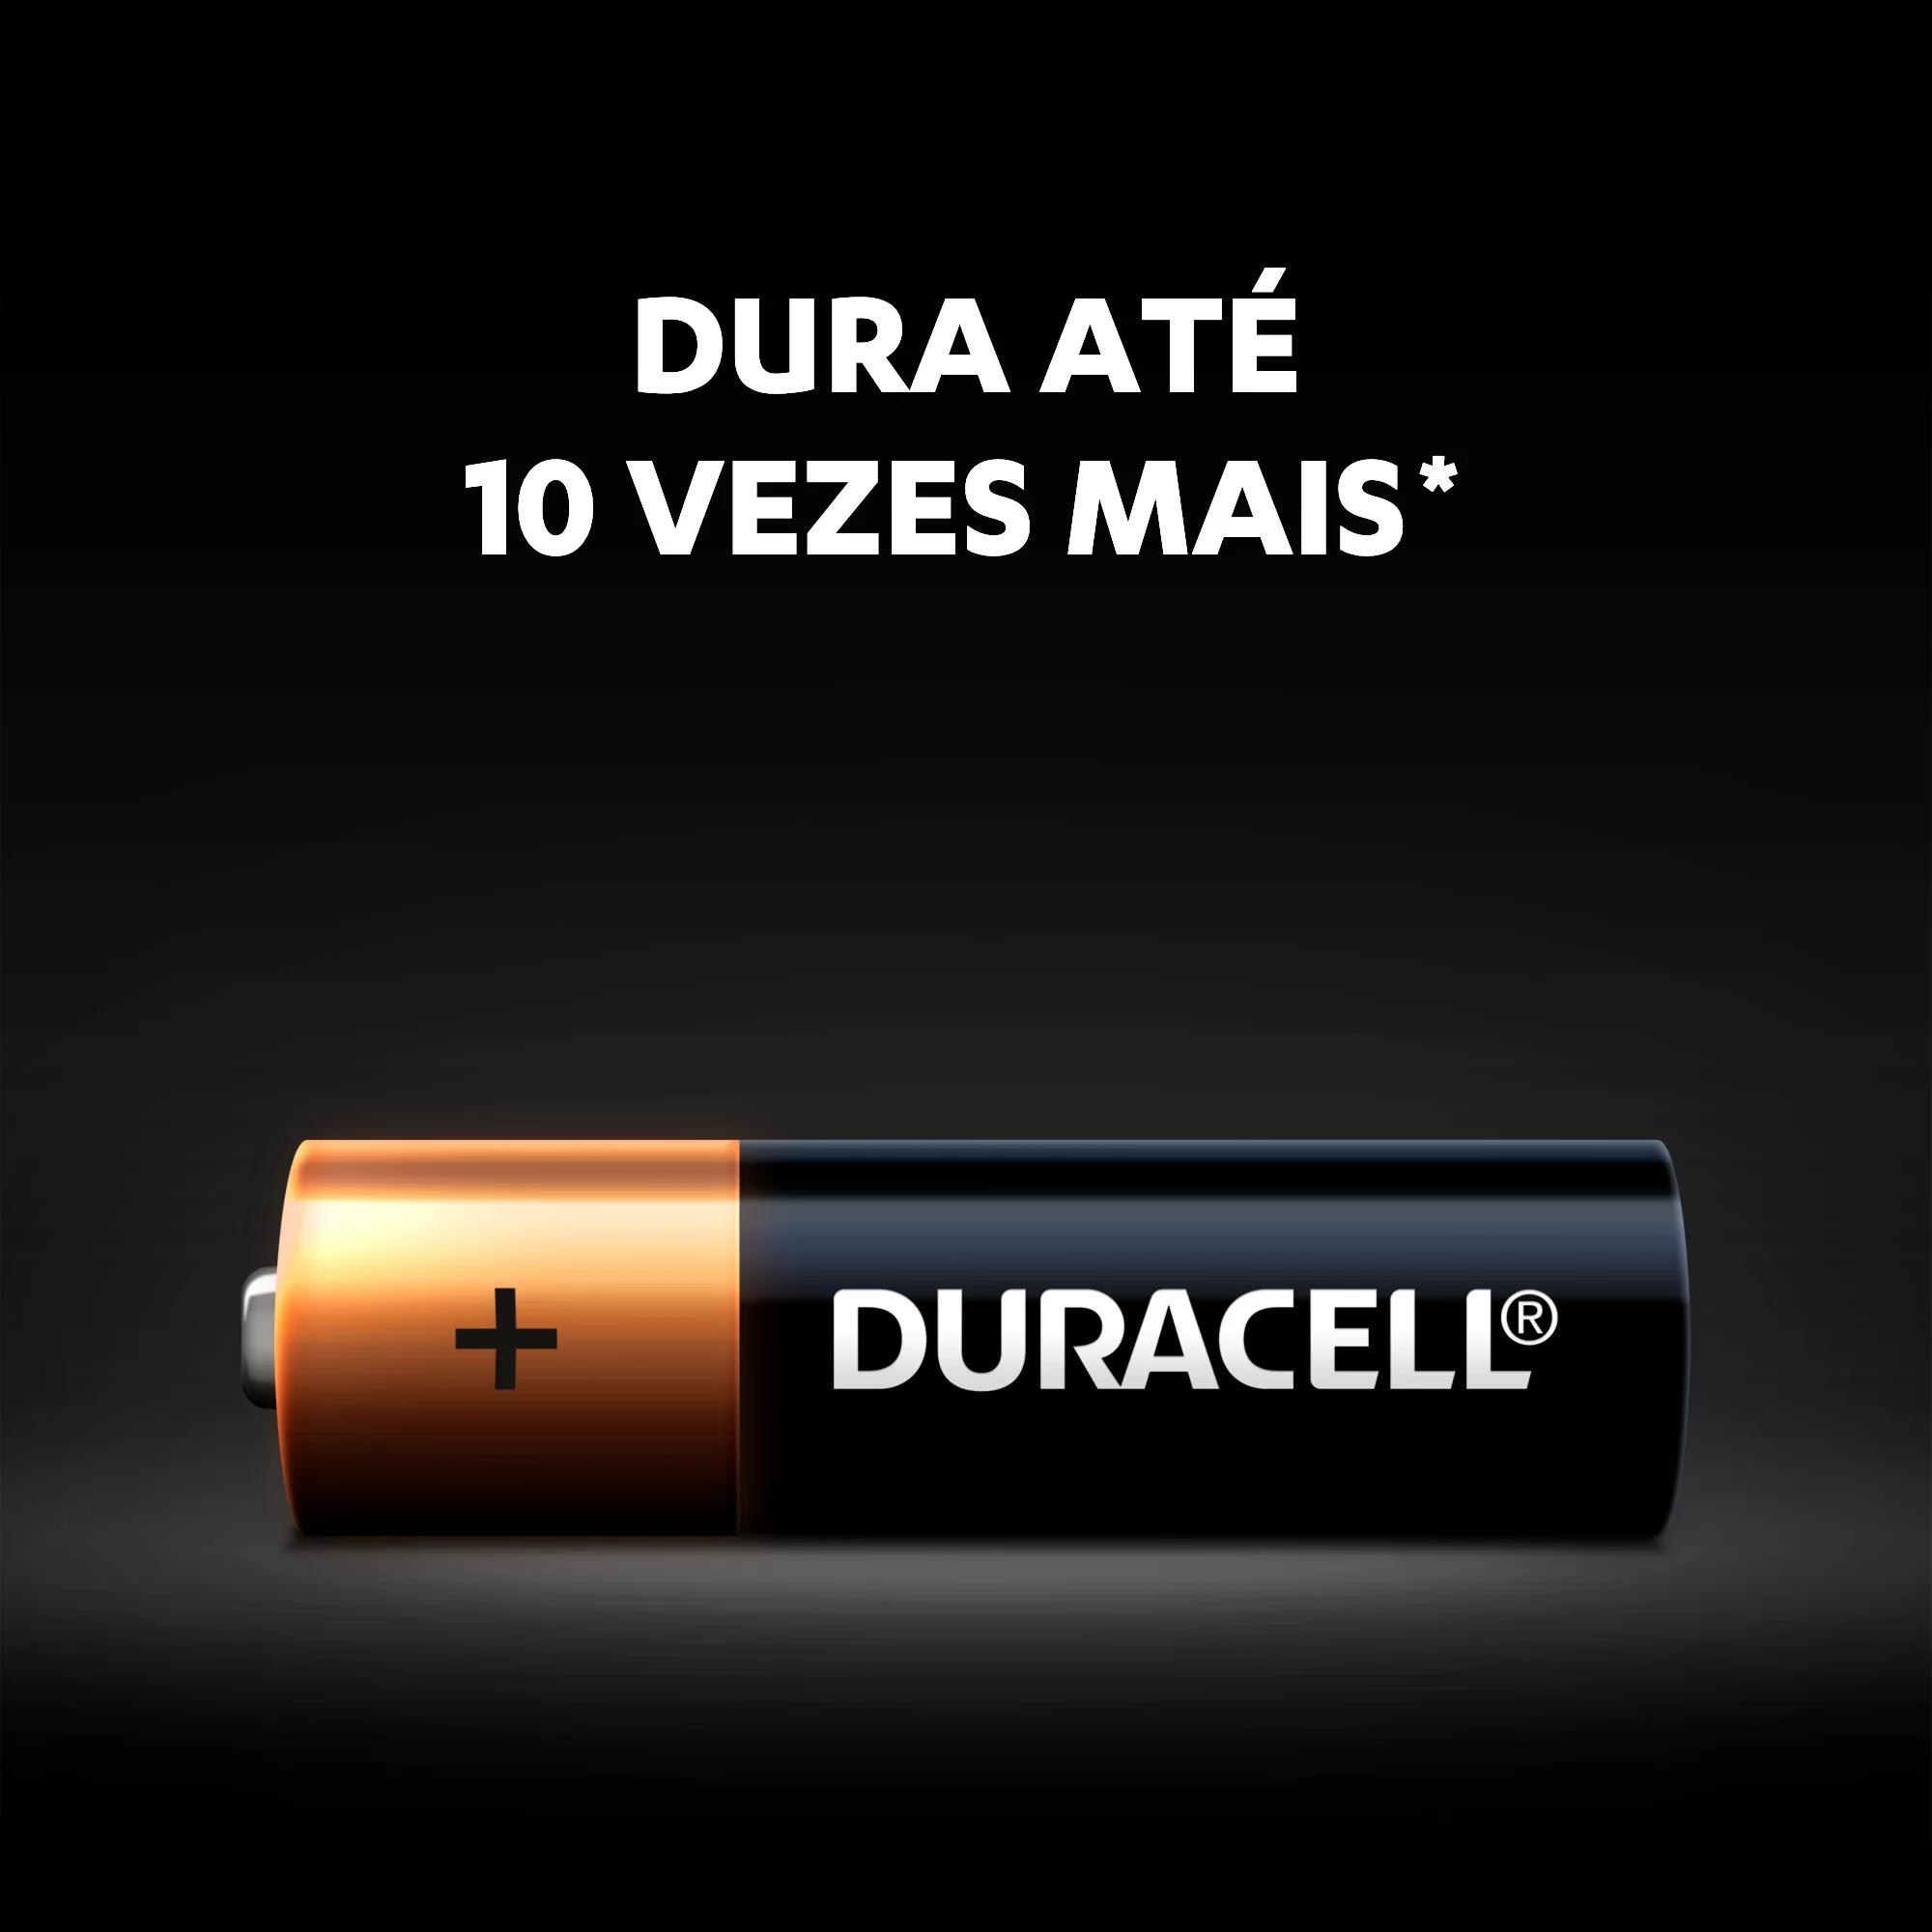 Kit 48 Pilhas Duracell Palito Aaa Cartela C/16 Econopack